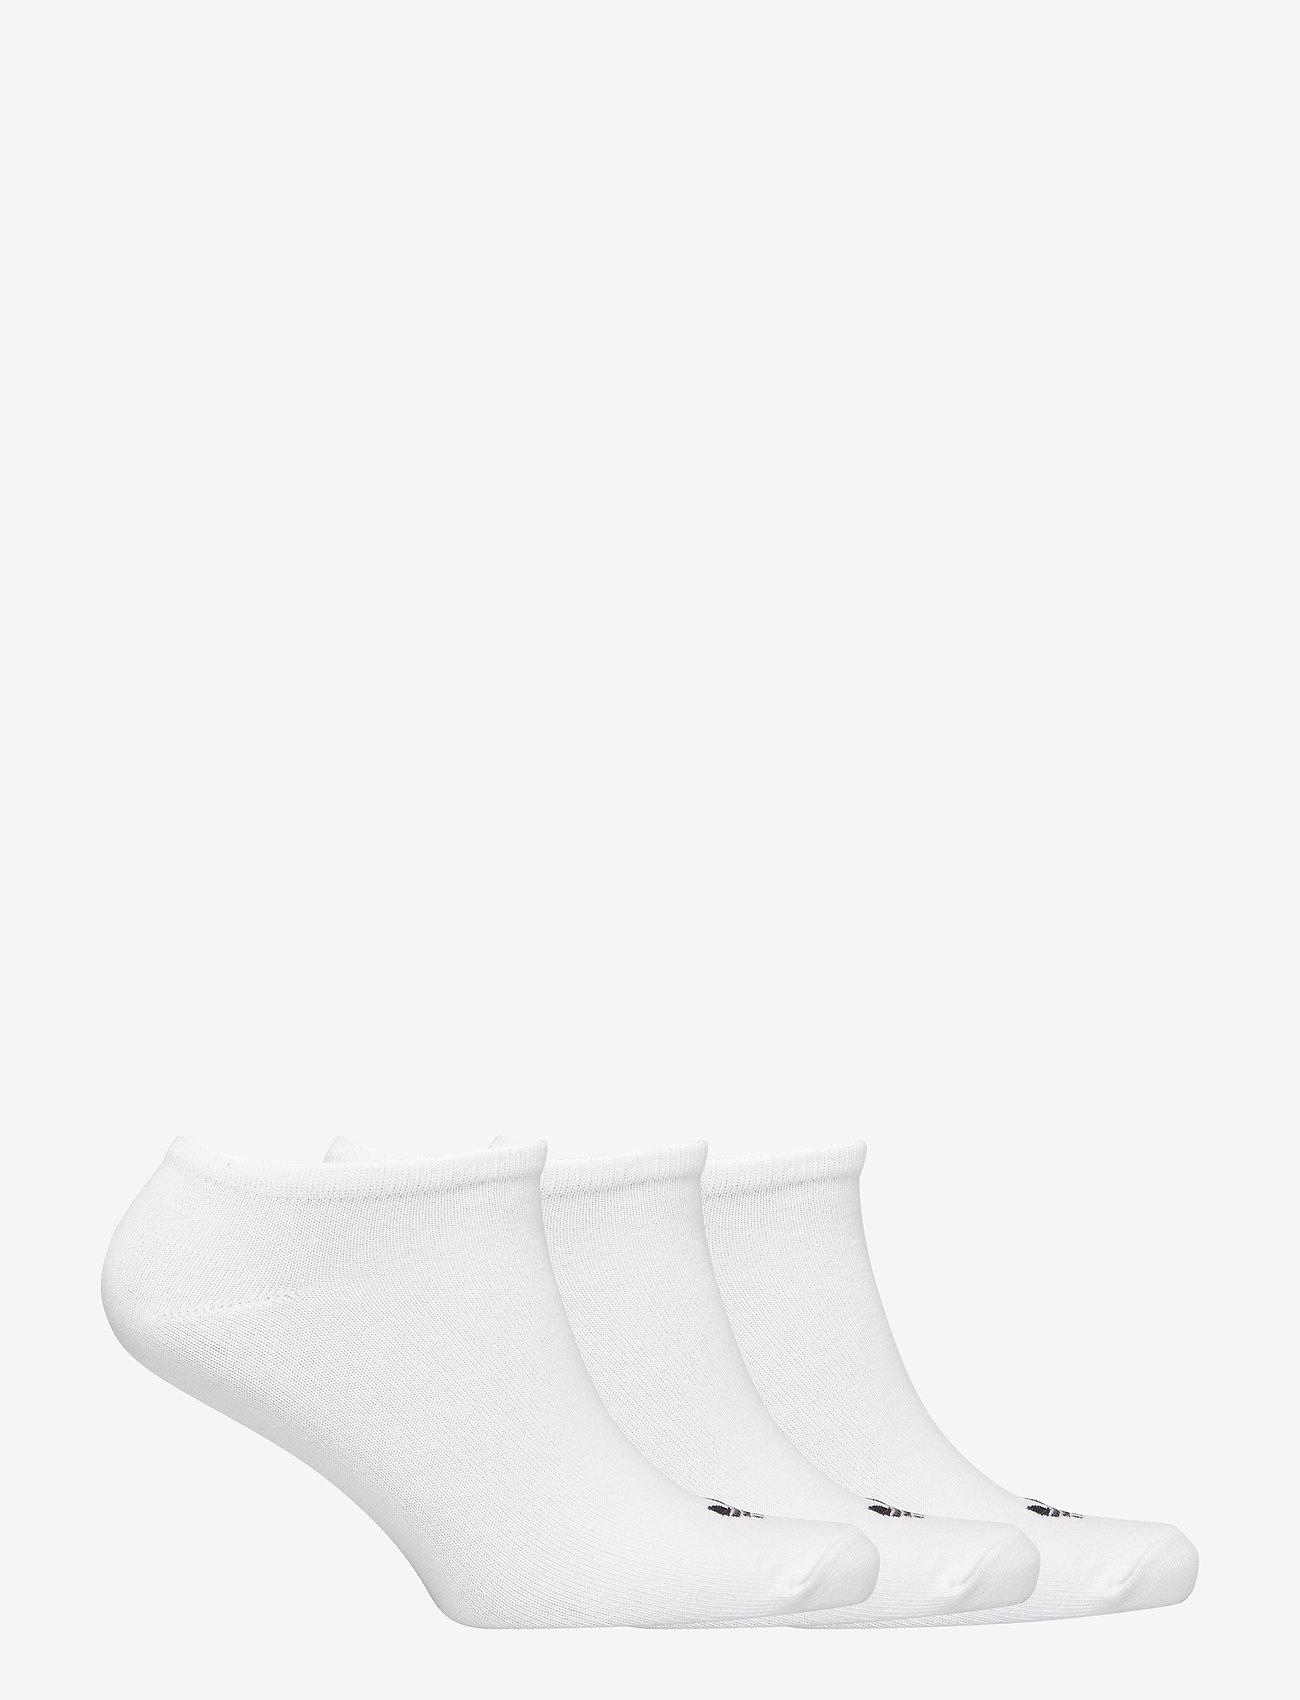 adidas Originals - TREFOIL LINER - steps & footies - white/white/black - 1